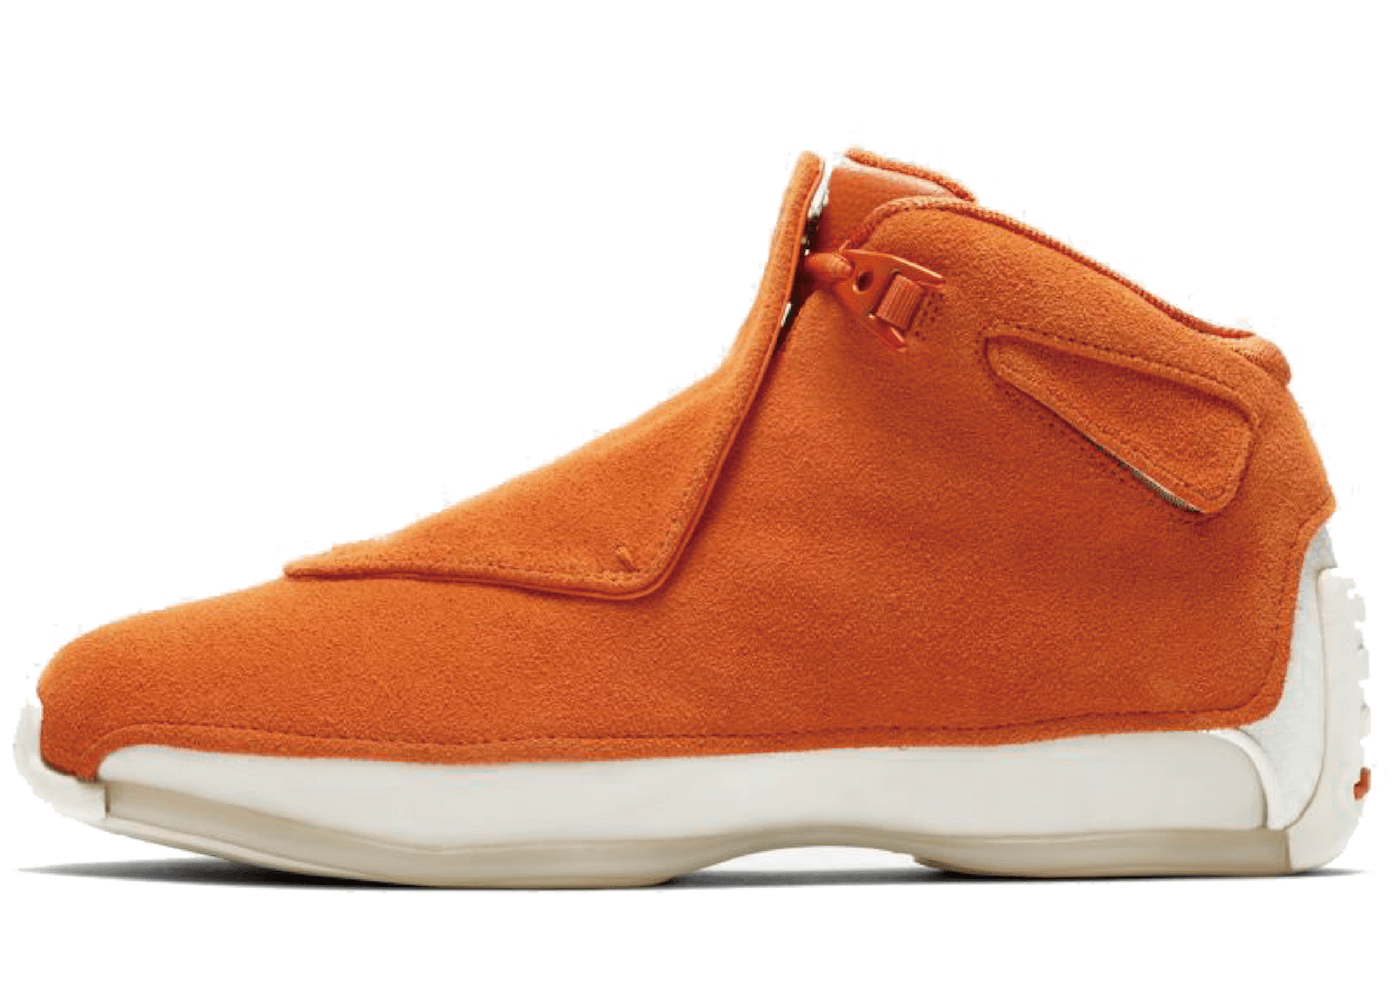 Nike Air Jordan 18 Retro Orangeの写真